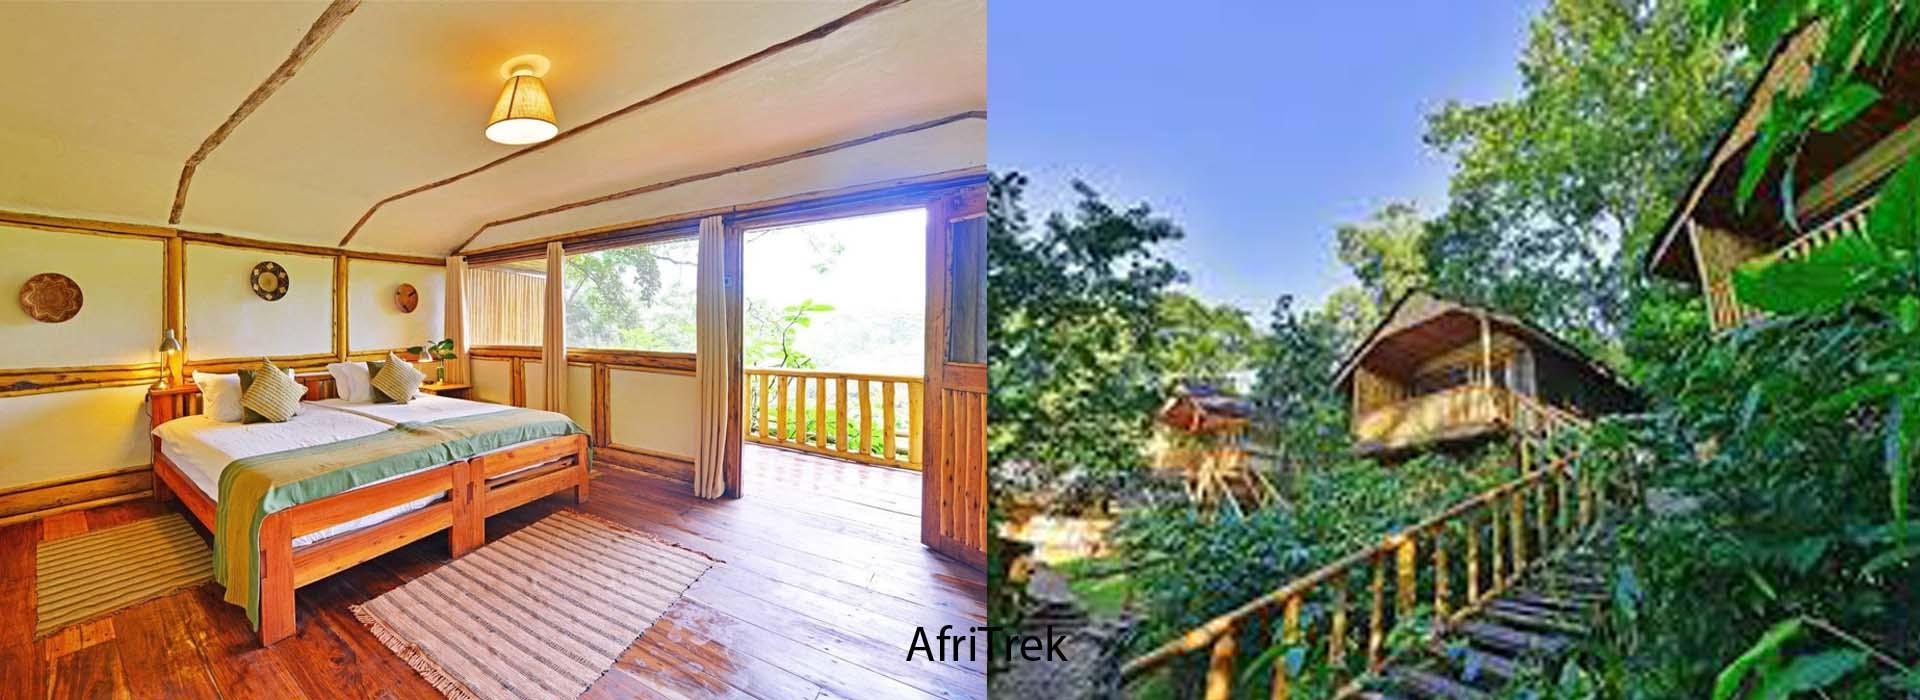 Buhoma Lodge - Gorilla trekking in Buhoma